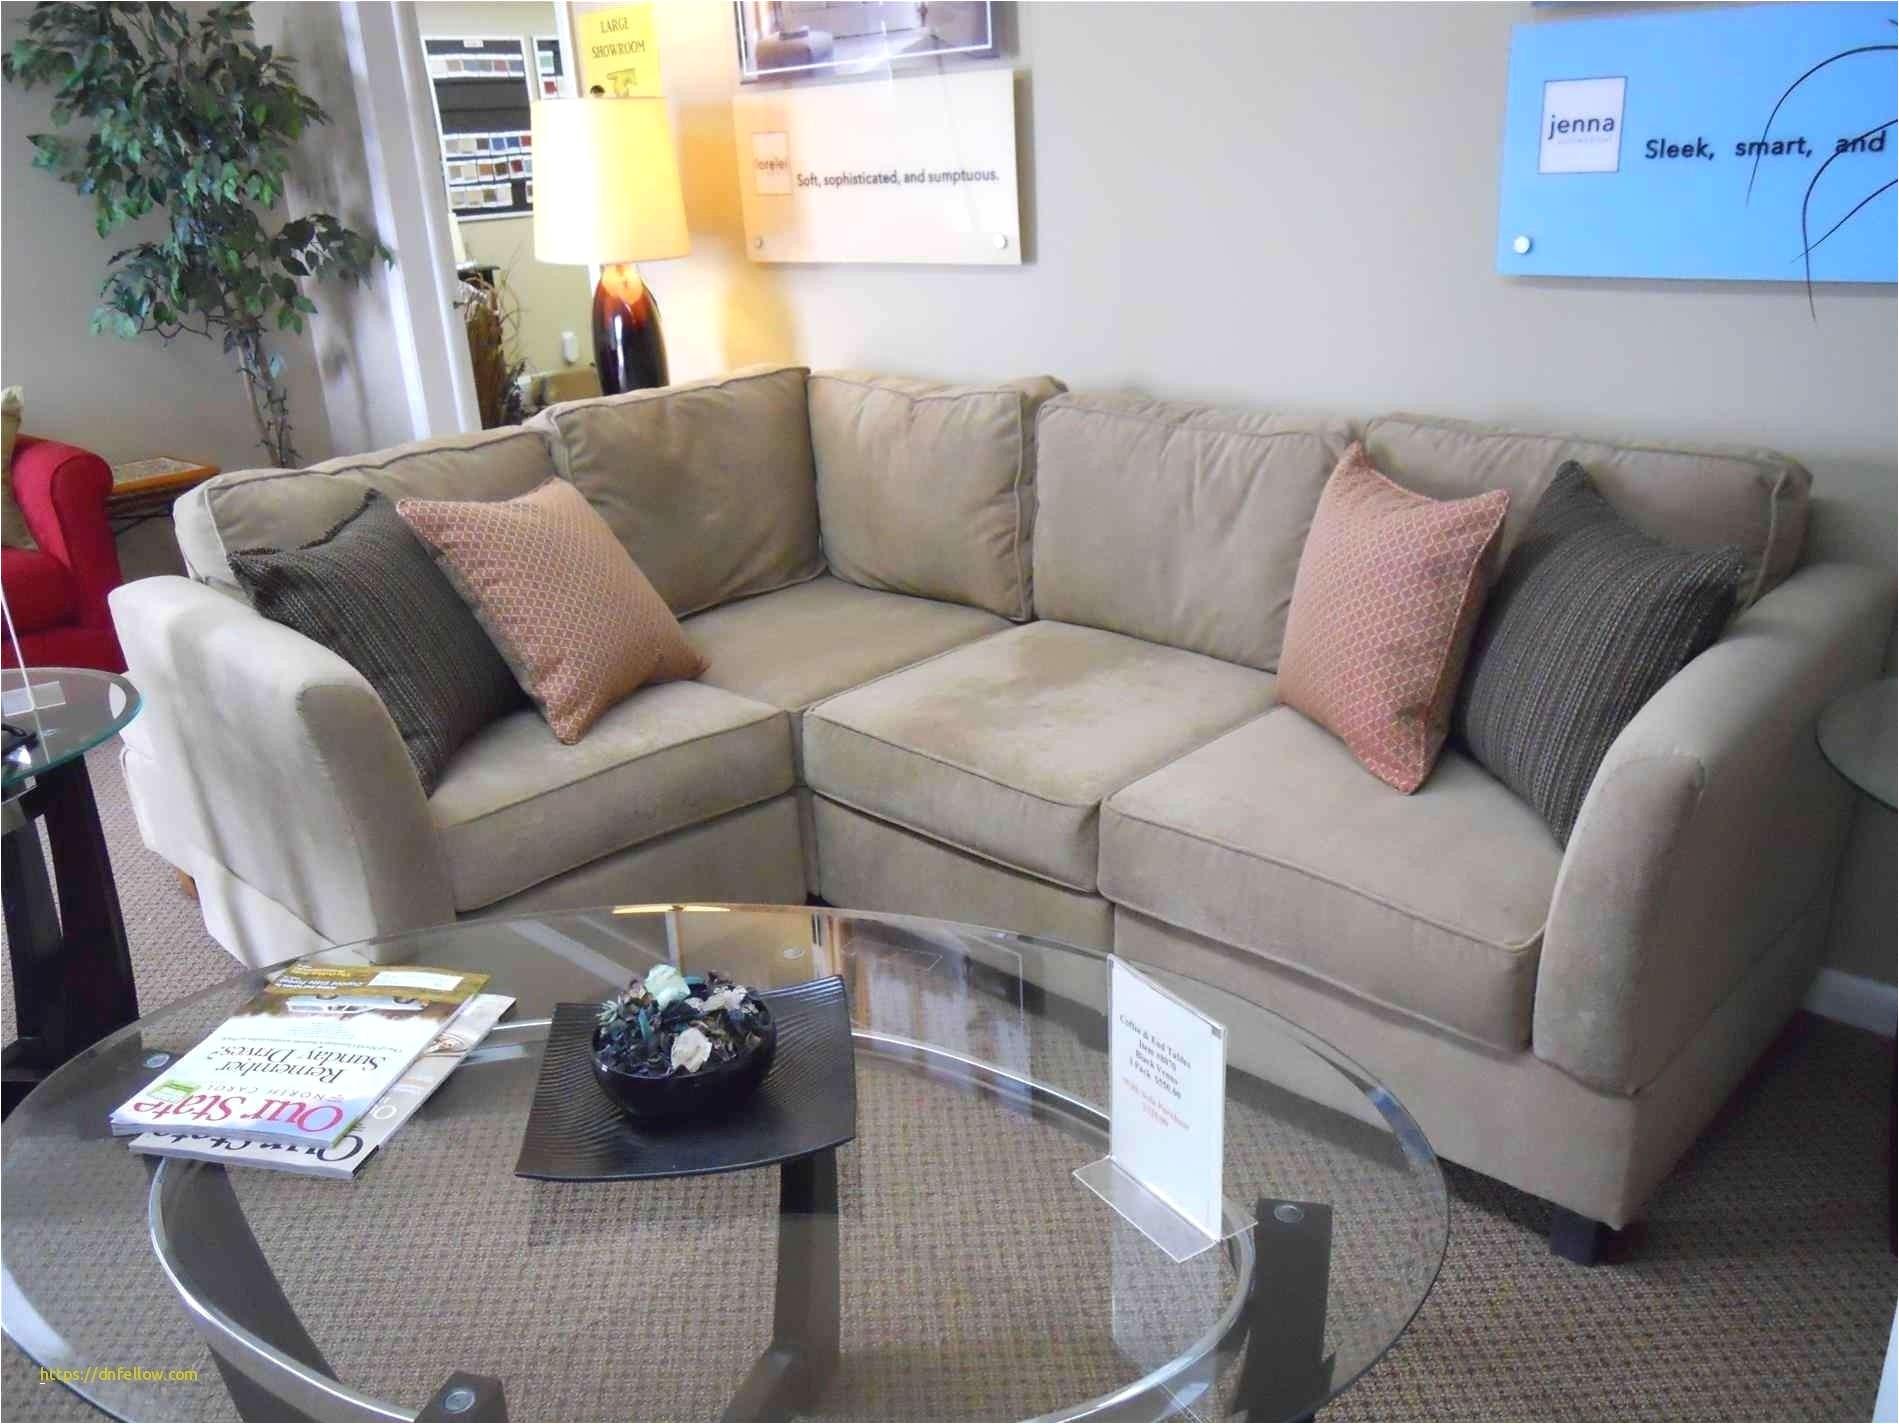 Italian Sectional sofa the Best Italian Modern Furniture sofa Italian sofas Italian sofas 0d' sofas